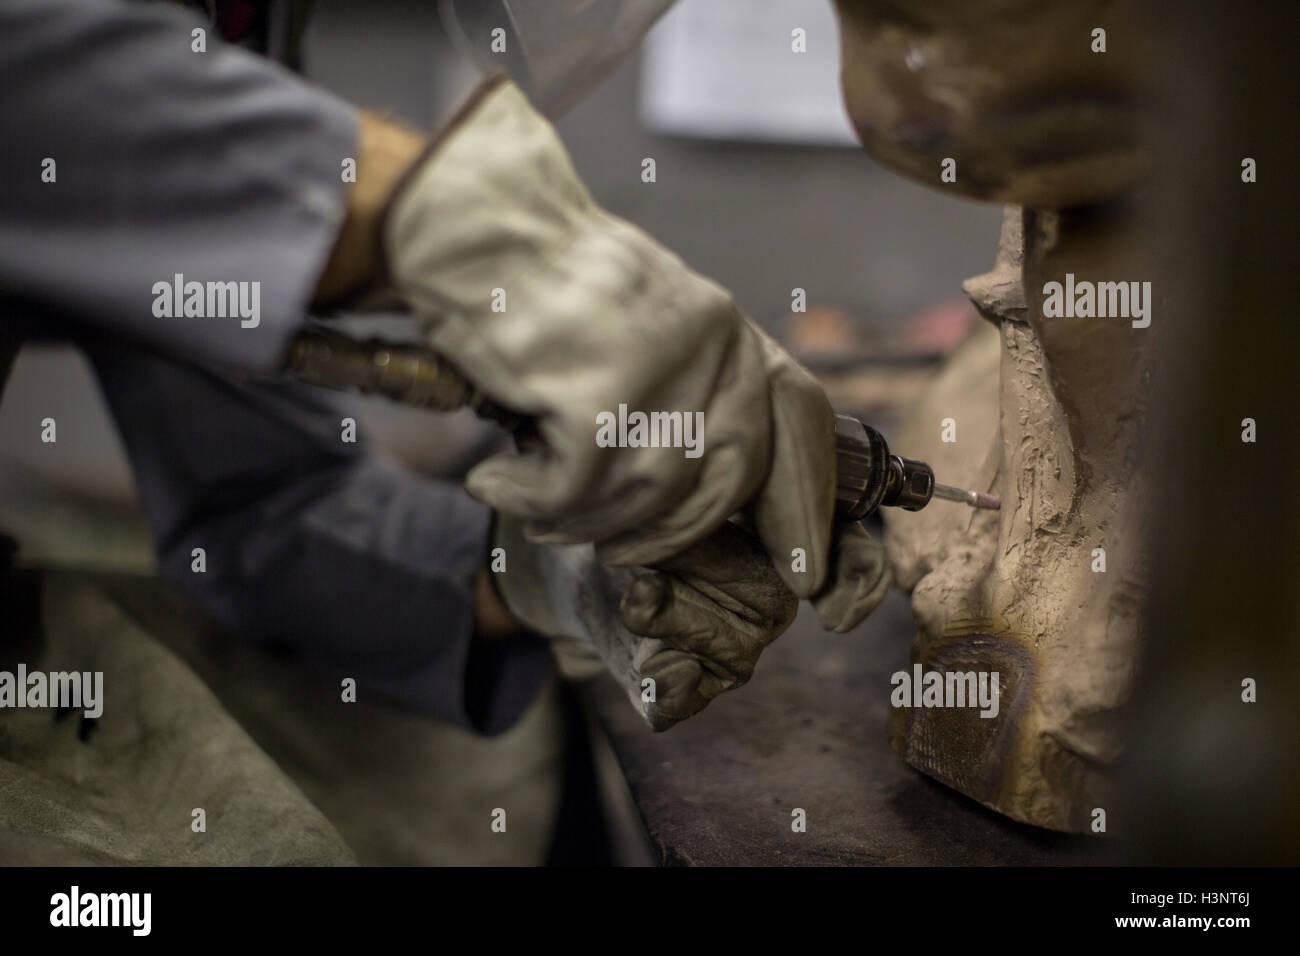 Sculptor in artists' studio creating sculpture using hand tool - Stock Image